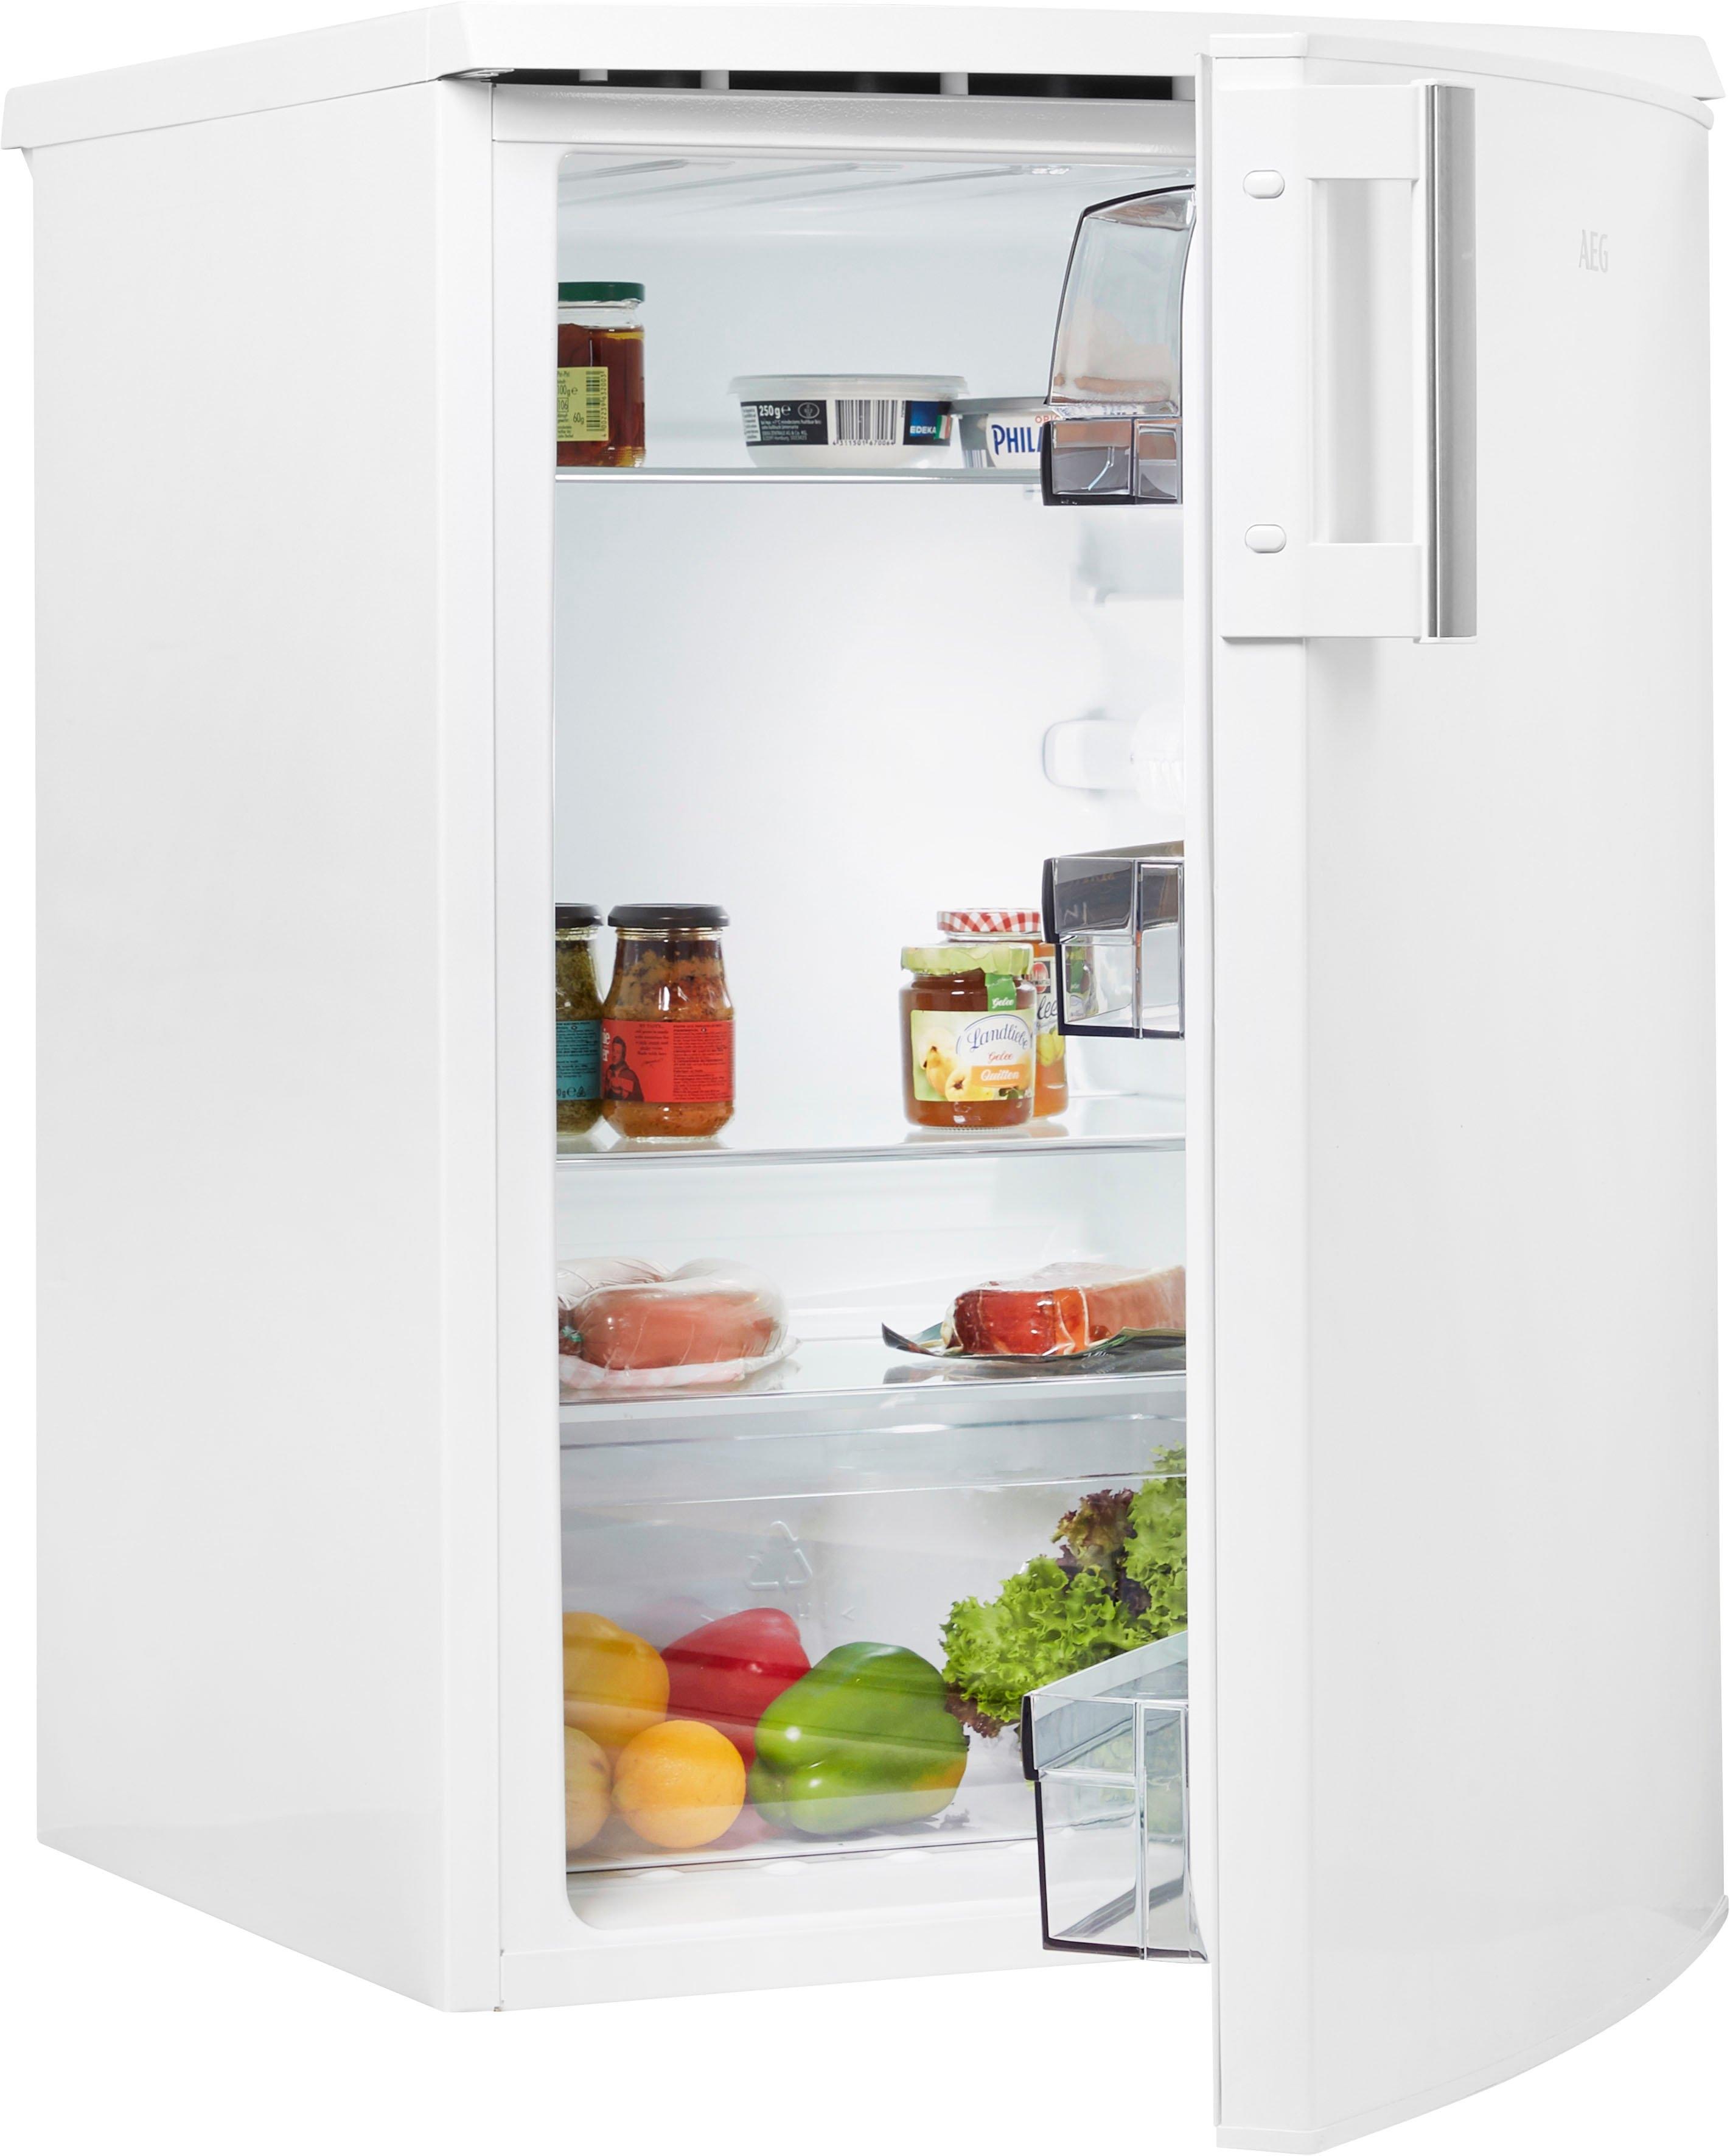 AEG »RTB415E1AW« koelkast veilig op otto.nl kopen